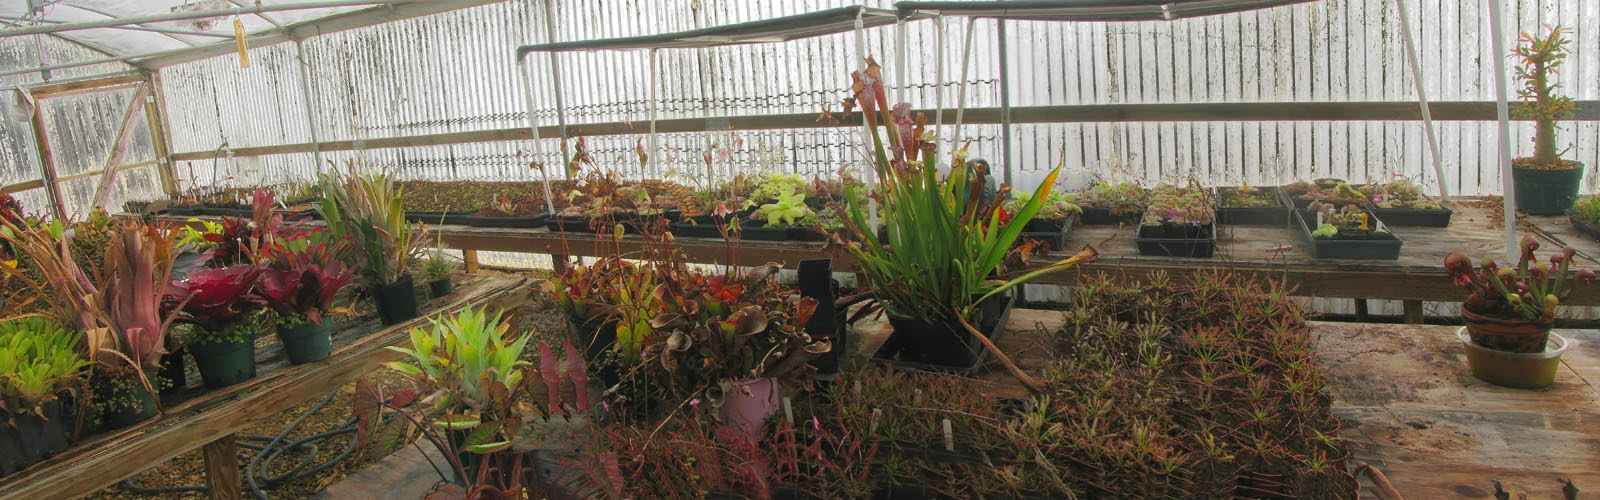 Mesa Exotics greenhouse panorama shot